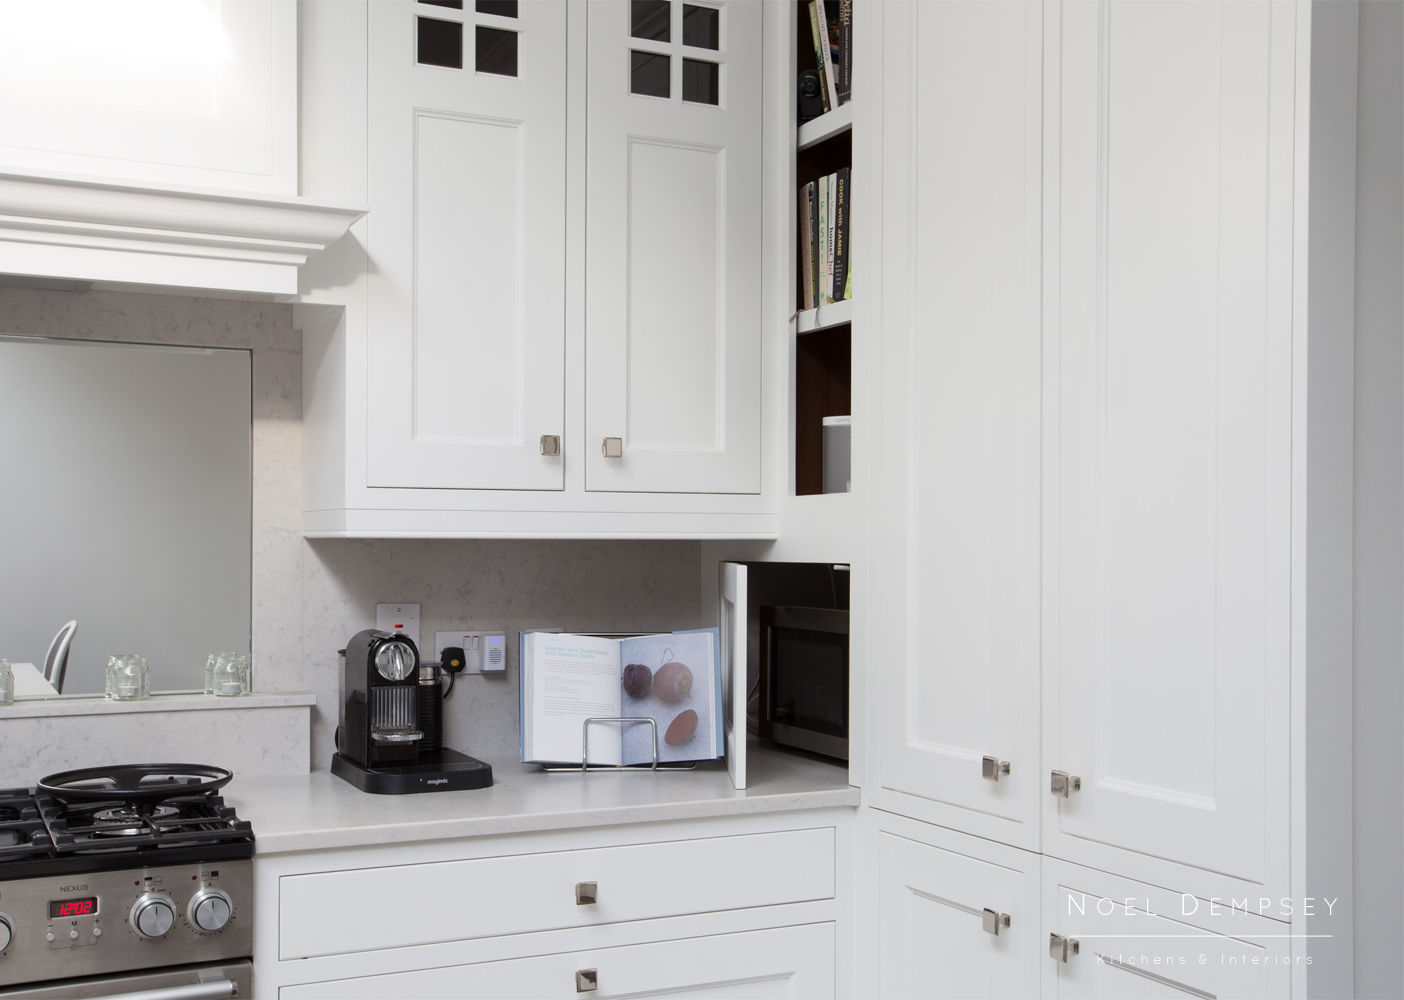 Merrion-Hand-Painted-Kitchens-6.jpg